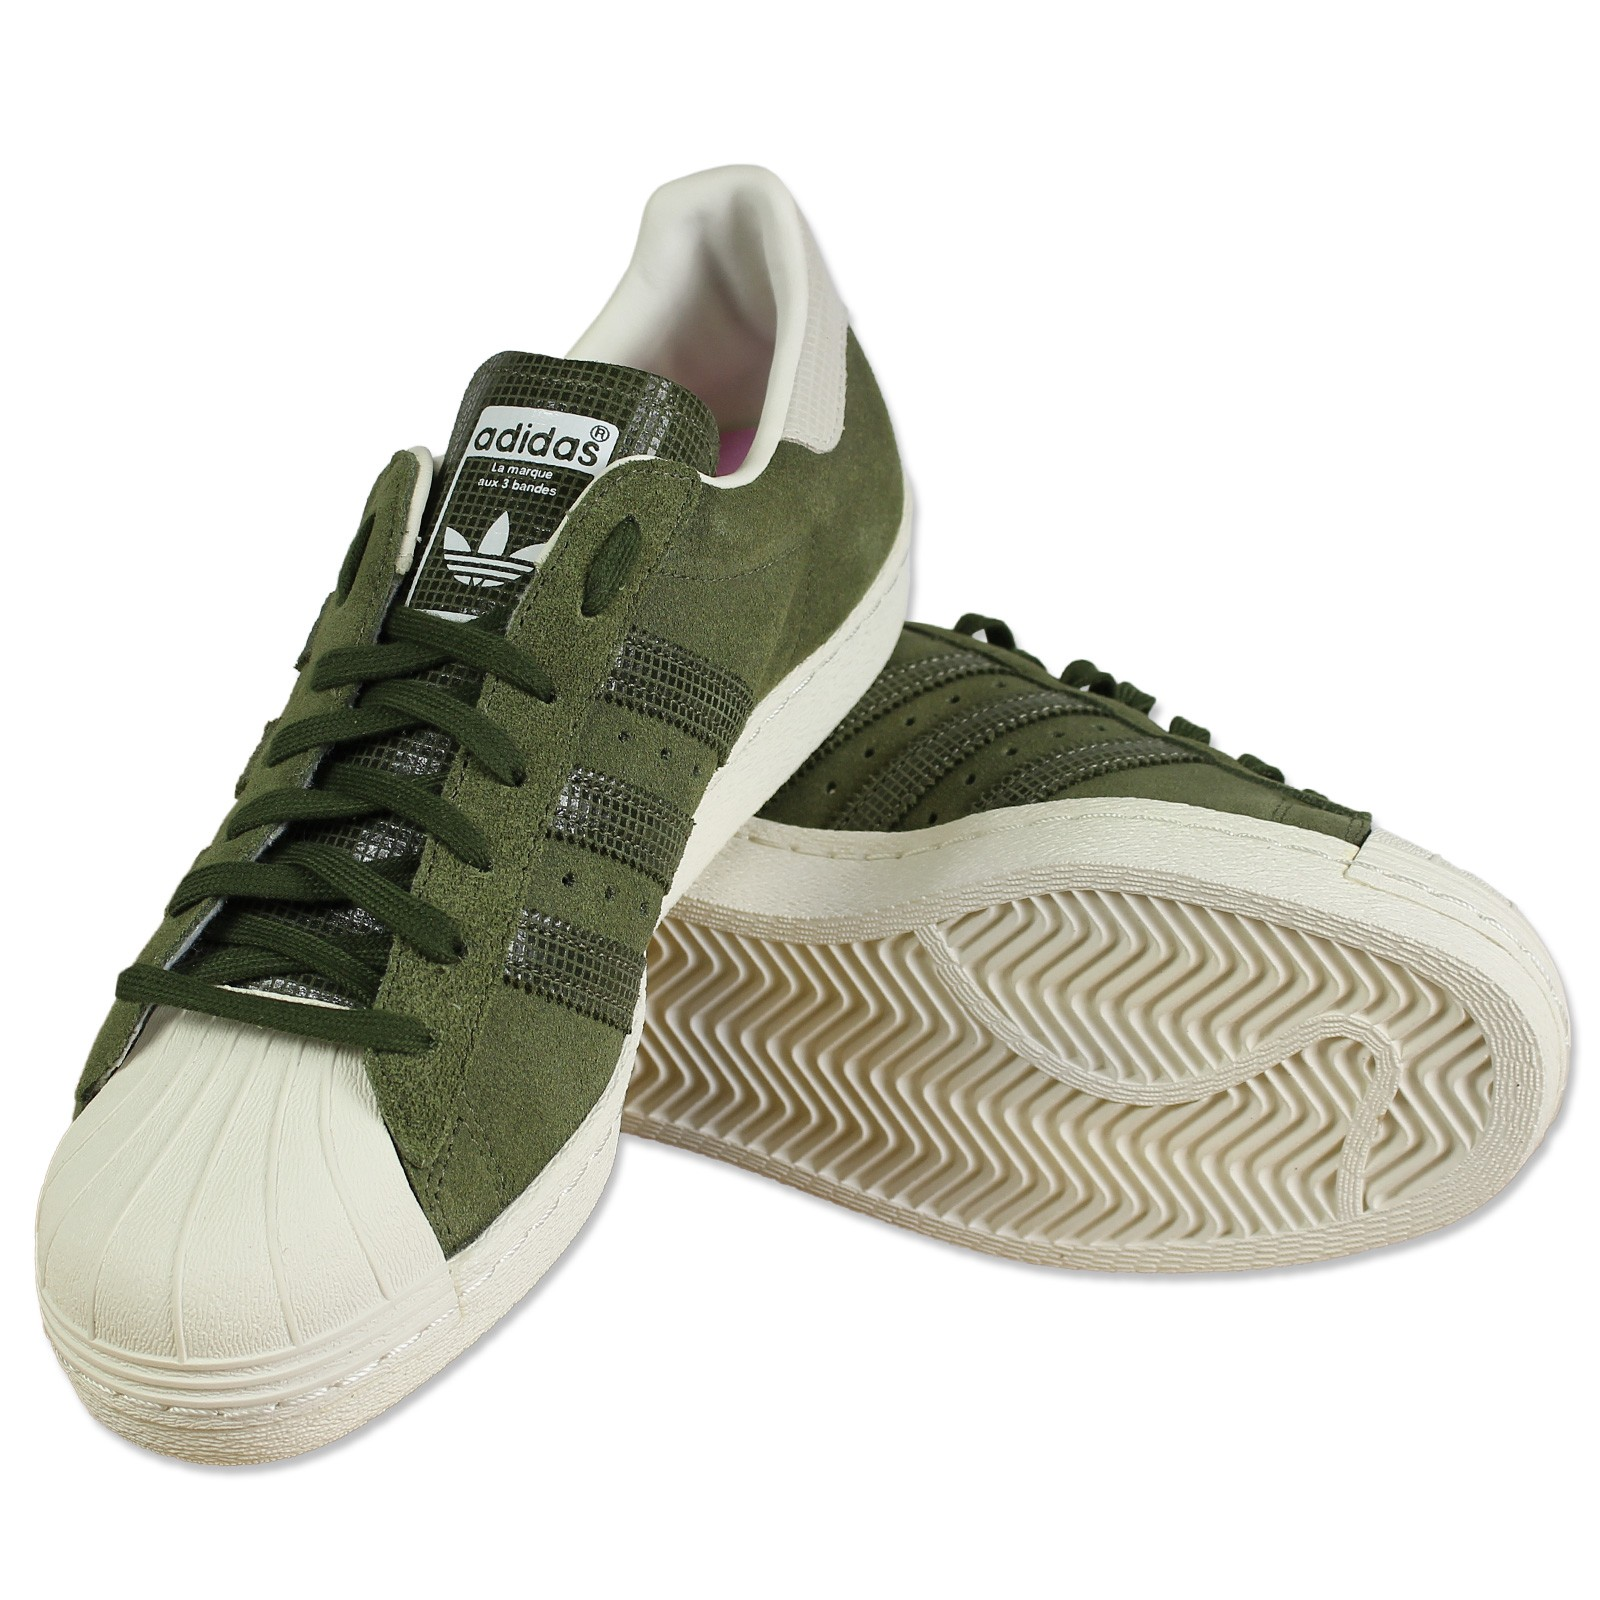 Suède Tennis Détails Chaussures Adidas Originals Sur Vert Daim Kaki 80s Superstar S81324 5L3jSAc4Rq